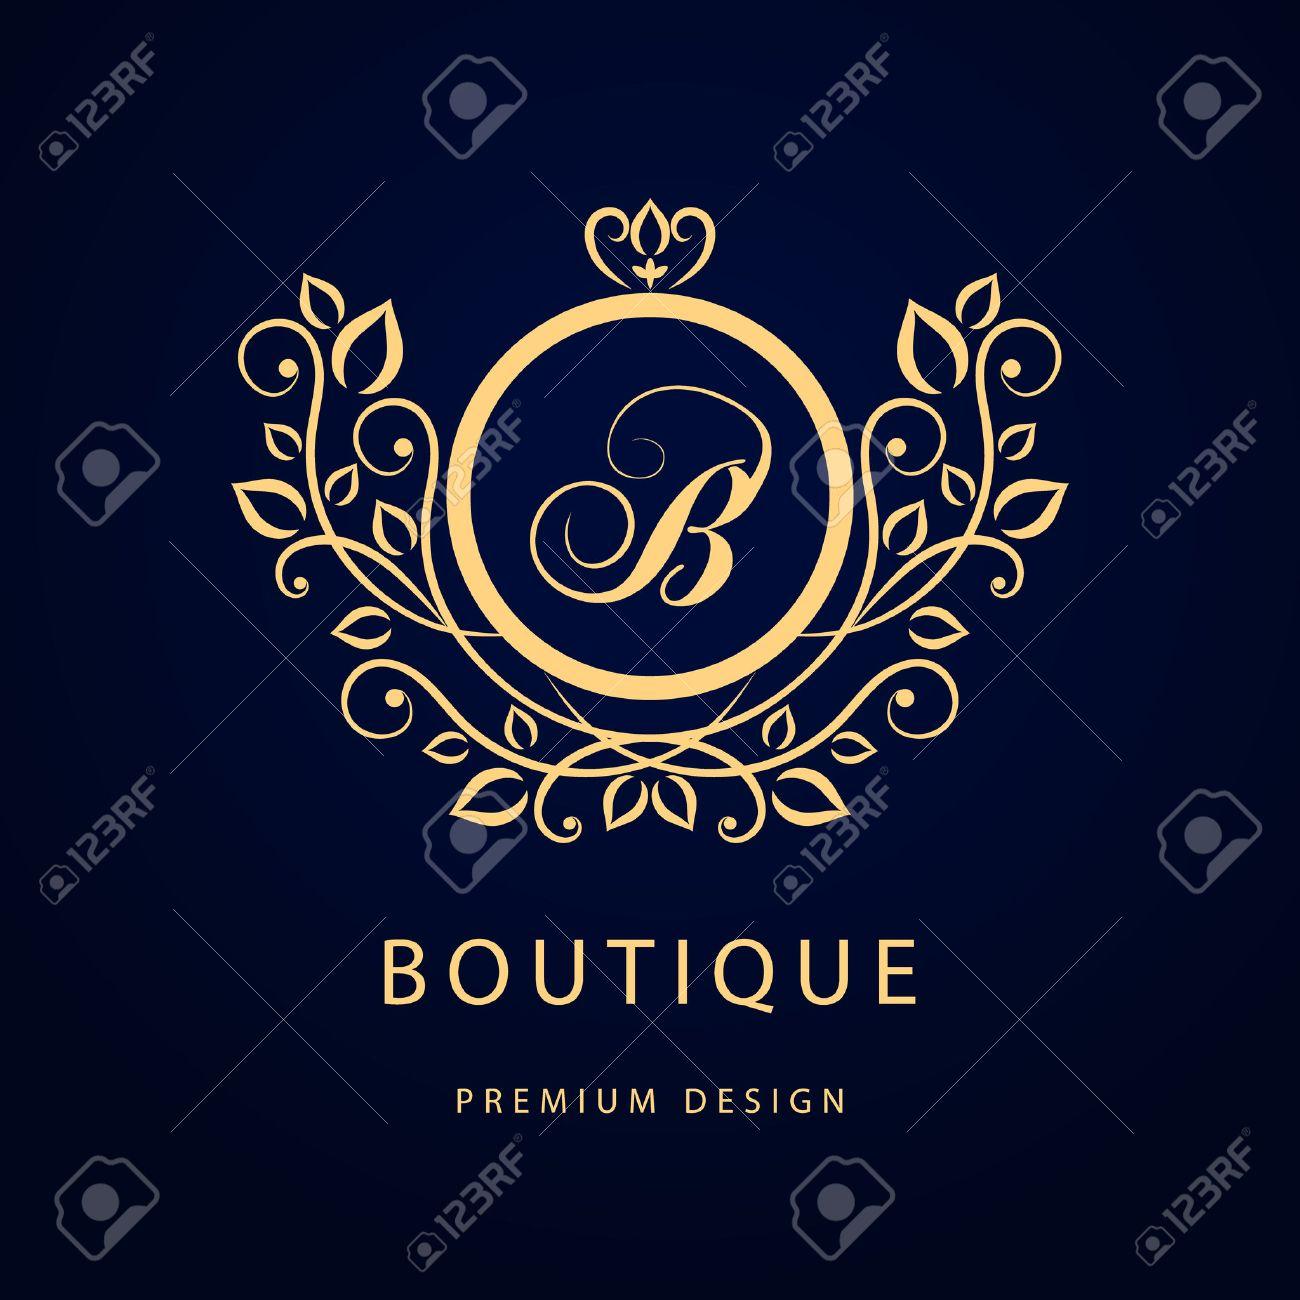 Vector graphic design business logo - Vector Vector Illustration Of Monogram Design Elements Graceful Template Elegant Line Art Logo Design Business Sign Identity For Restaurant Royalty